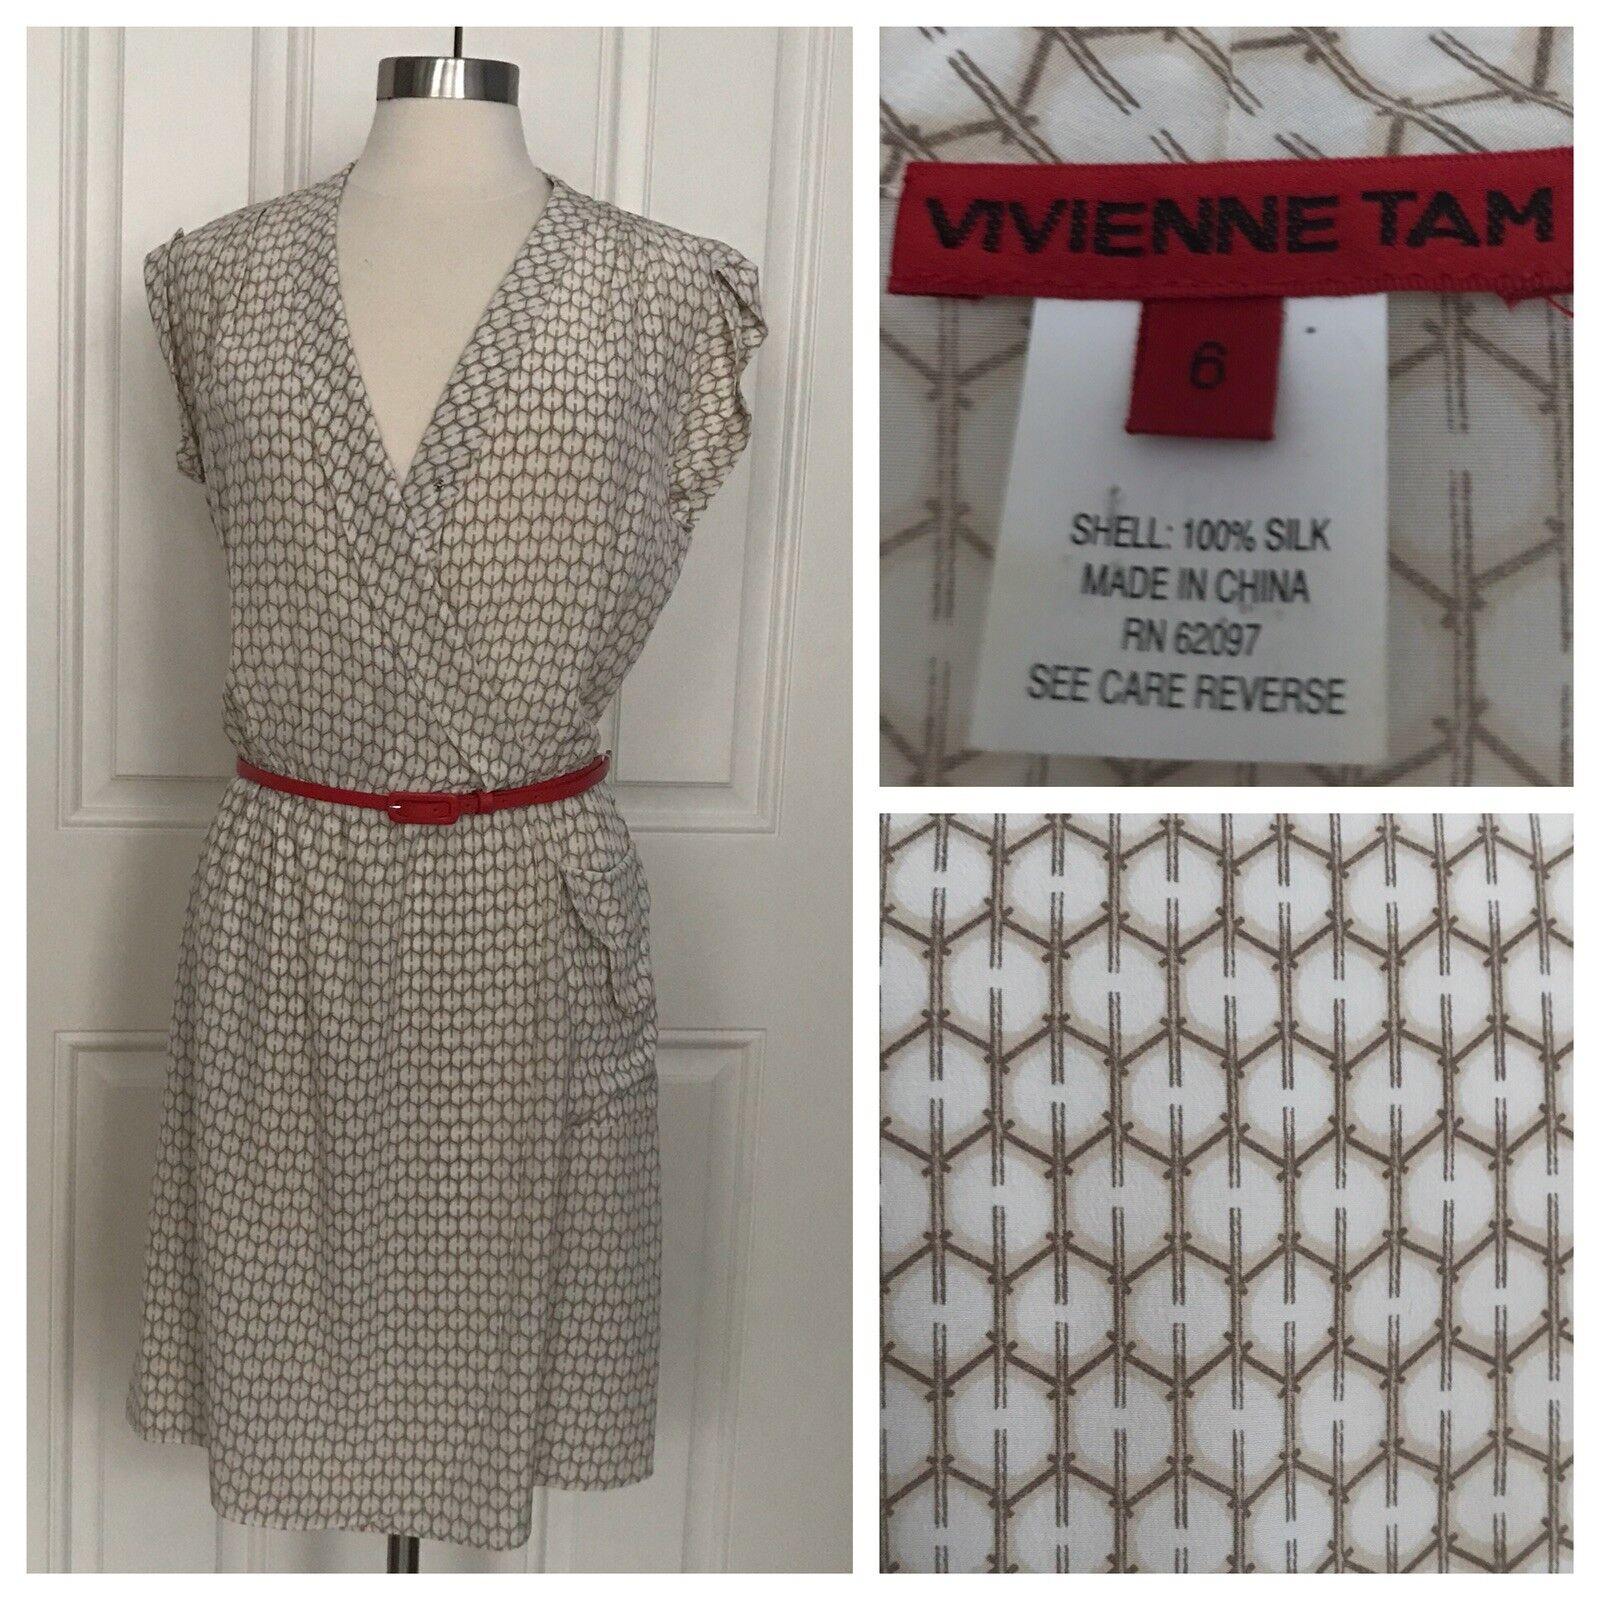 Vivienne Tam Woherren Weiß Printed 100% Silk Mock Geo Print Wrap Dress damen 6